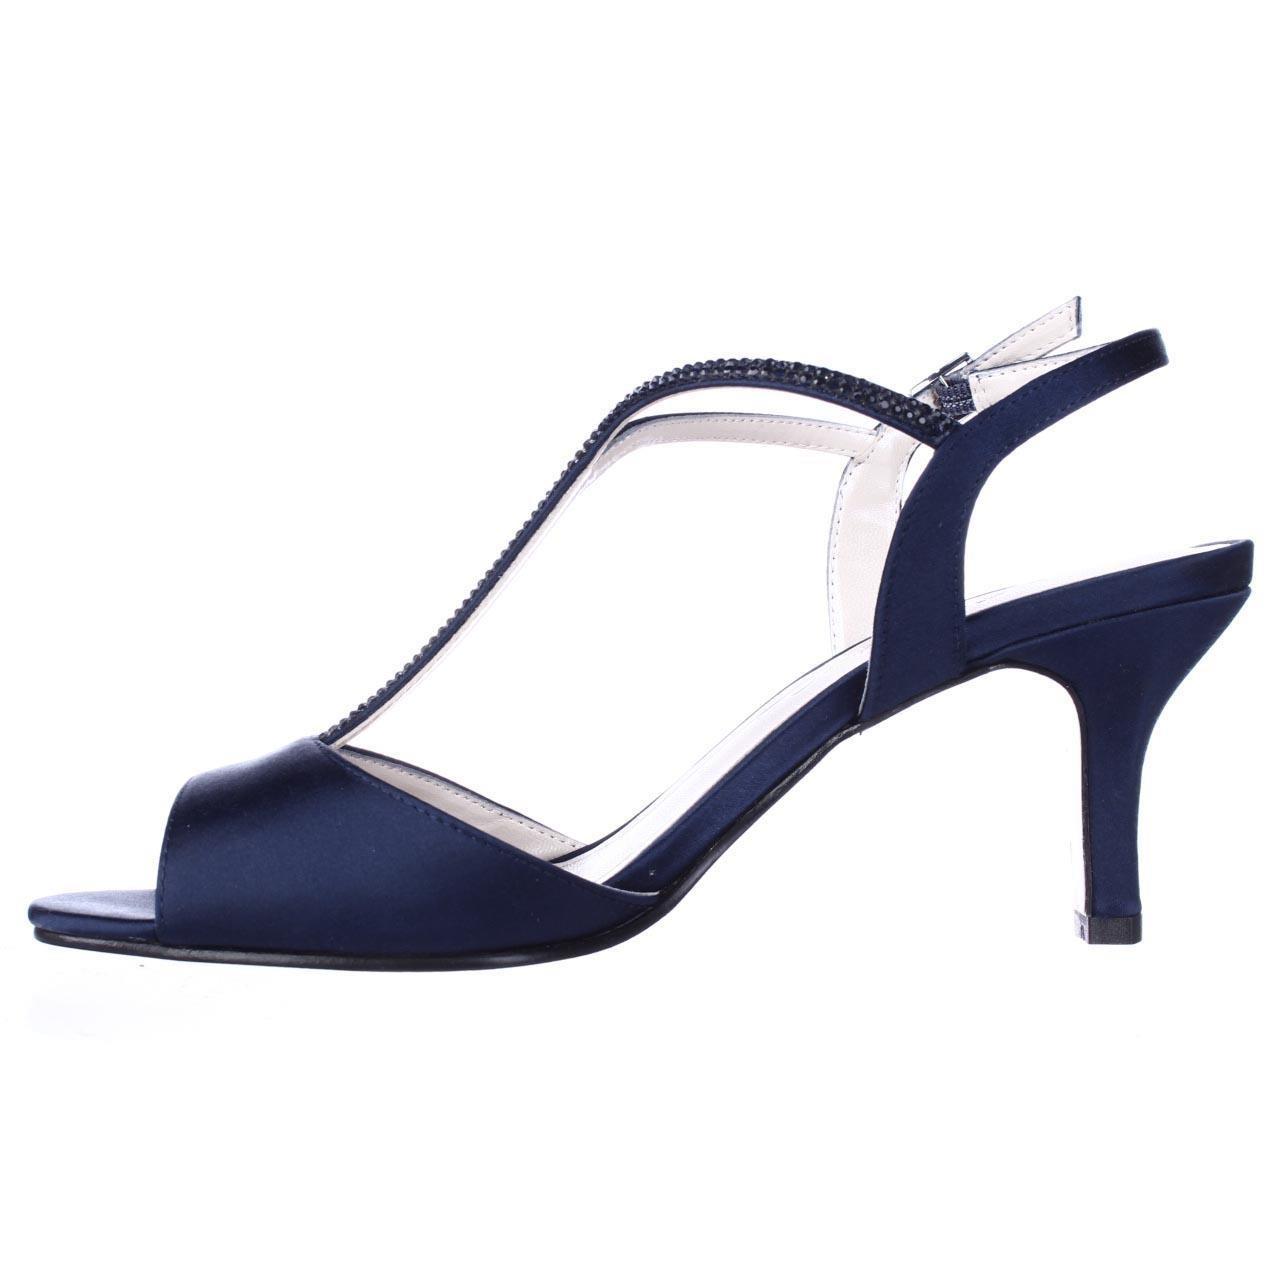 315b0cc23 PairMySole  Caparros Womens Delicia Open Toe Formal T-Strap Sandals ...